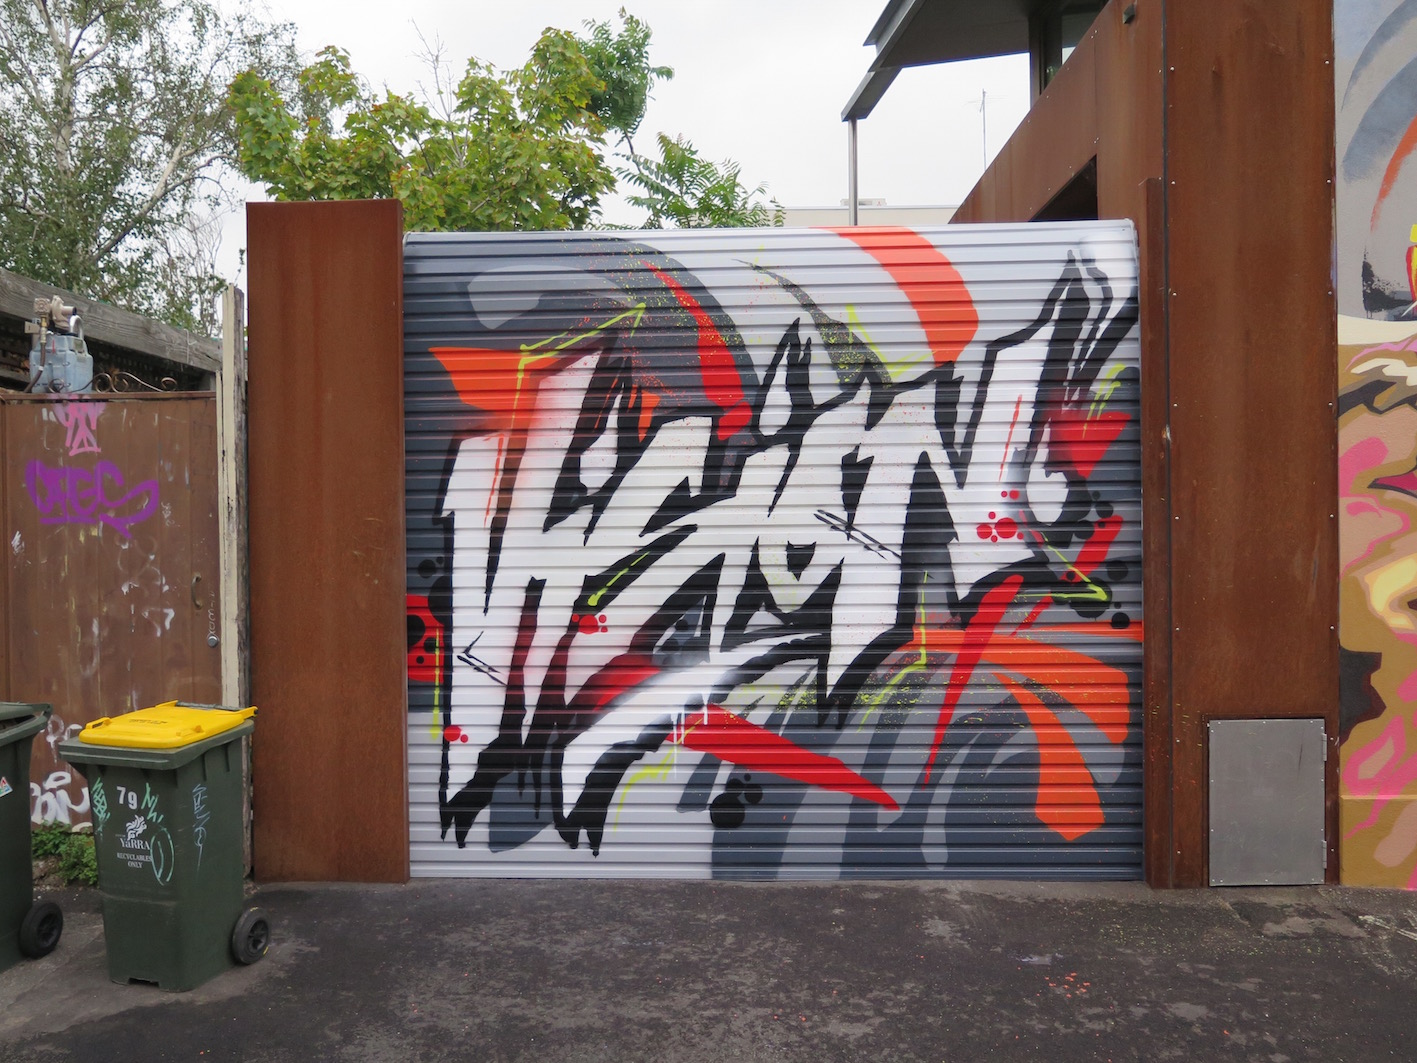 deansunshine_landofsunshine_melbourne_streetart_graffiti_adnate sirum 2016 2